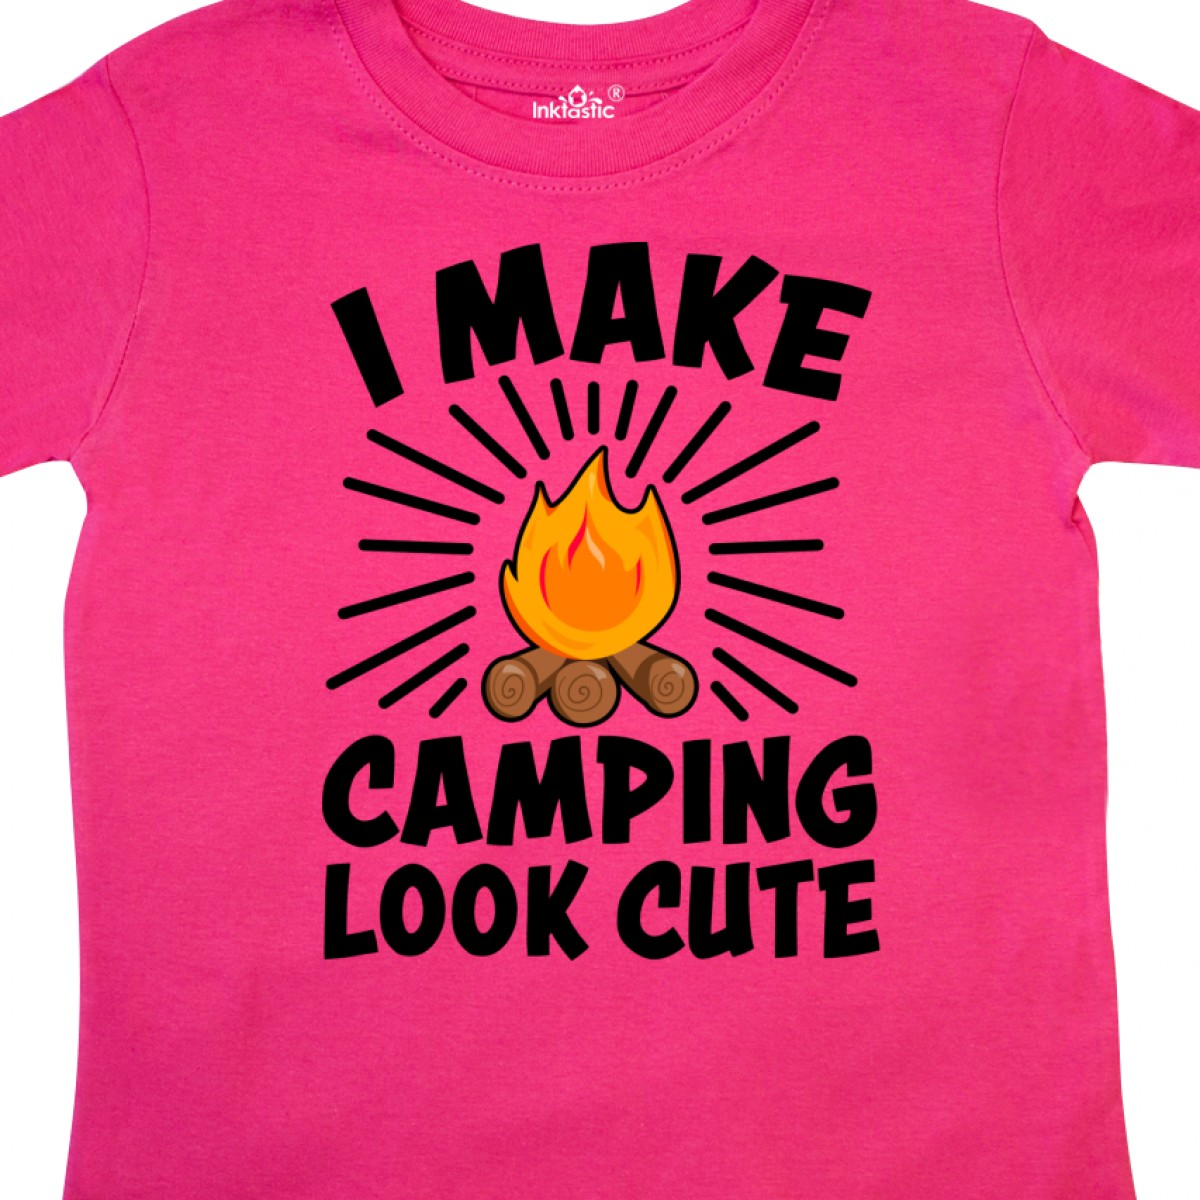 Inktastic-I-Make-Camping-Look-Cute-Toddler-T-Shirt-Love-Outdoors-Nature-Campfire thumbnail 4